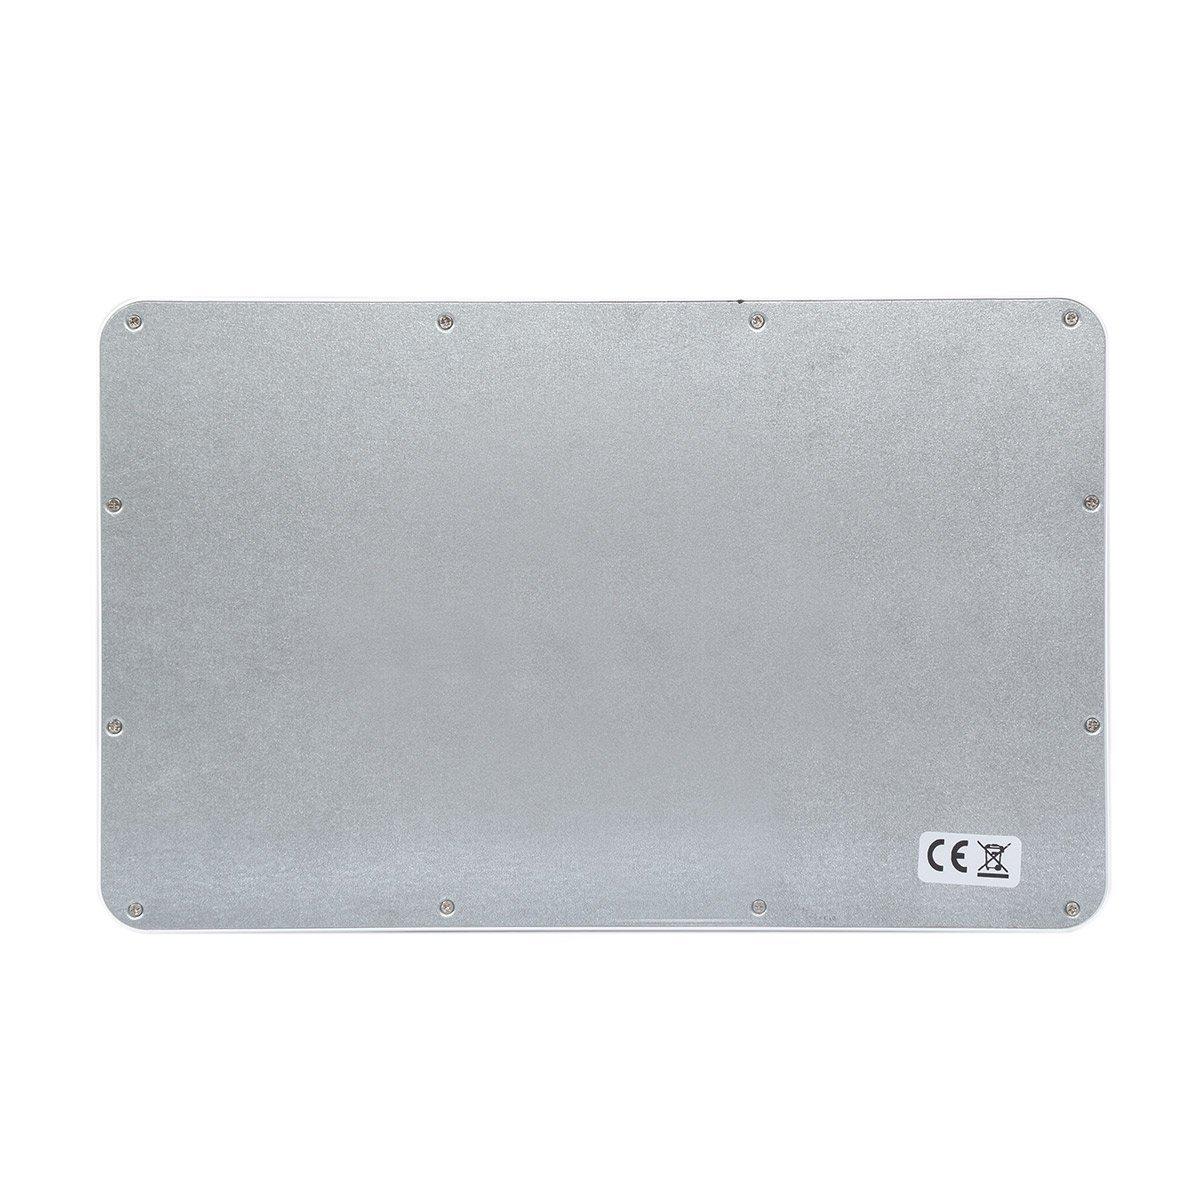 CoastaCloud Portable 10-inch Ultra Slim ABS Wireless Bluetooth Keyboard for iPad 10.5, iPad 9.7'', iPad Pro, iPad Air, iPad 2/3/4, Galaxy Tab Note and Any iOS, Android, Windows Tablets (White) by CoastaCloud (Image #8)